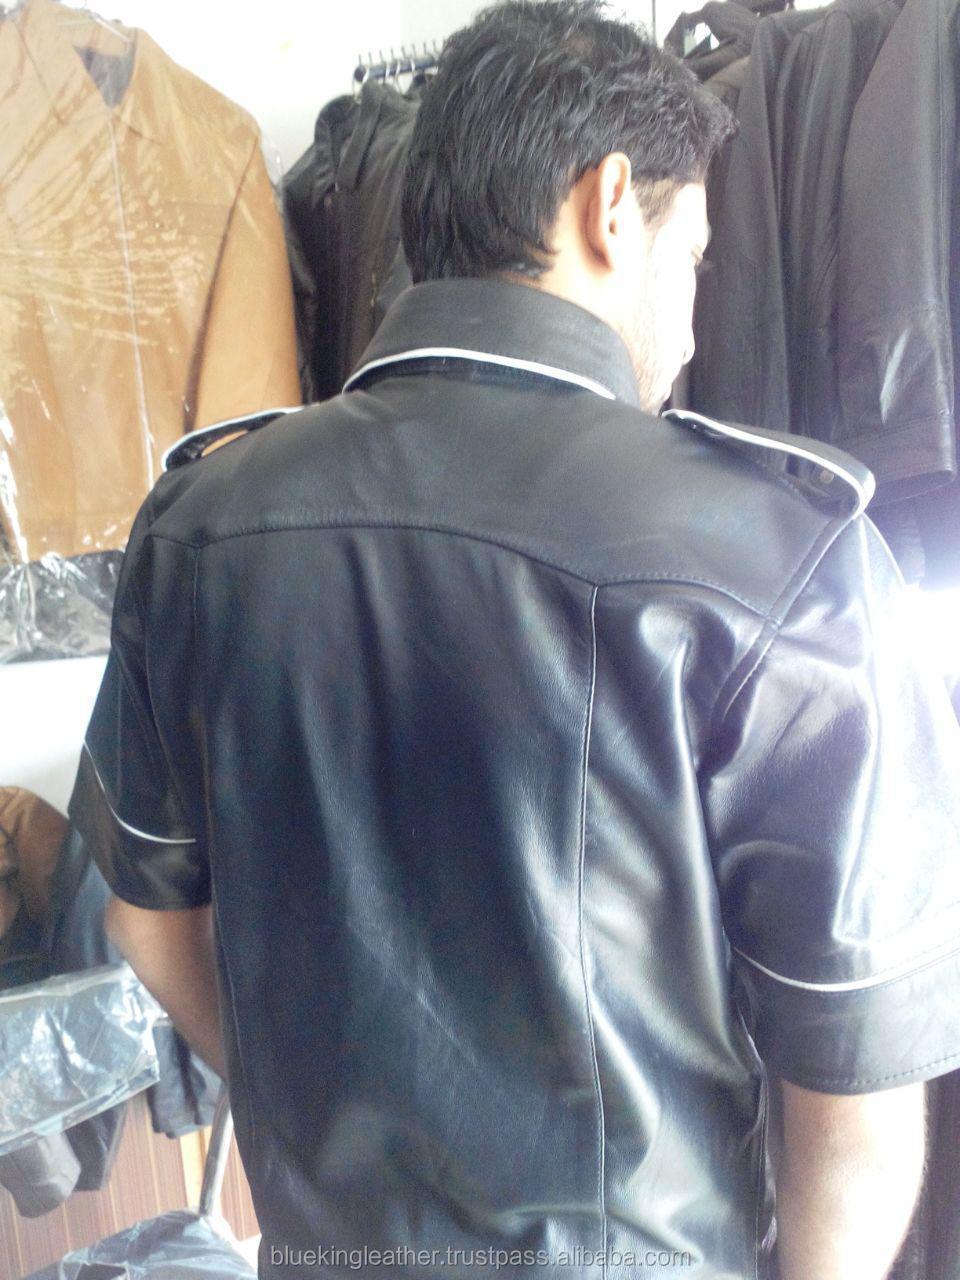 Hommes Véritable Cuir Noir Police Style Militaire Chemise Gay BLUF pleine manches